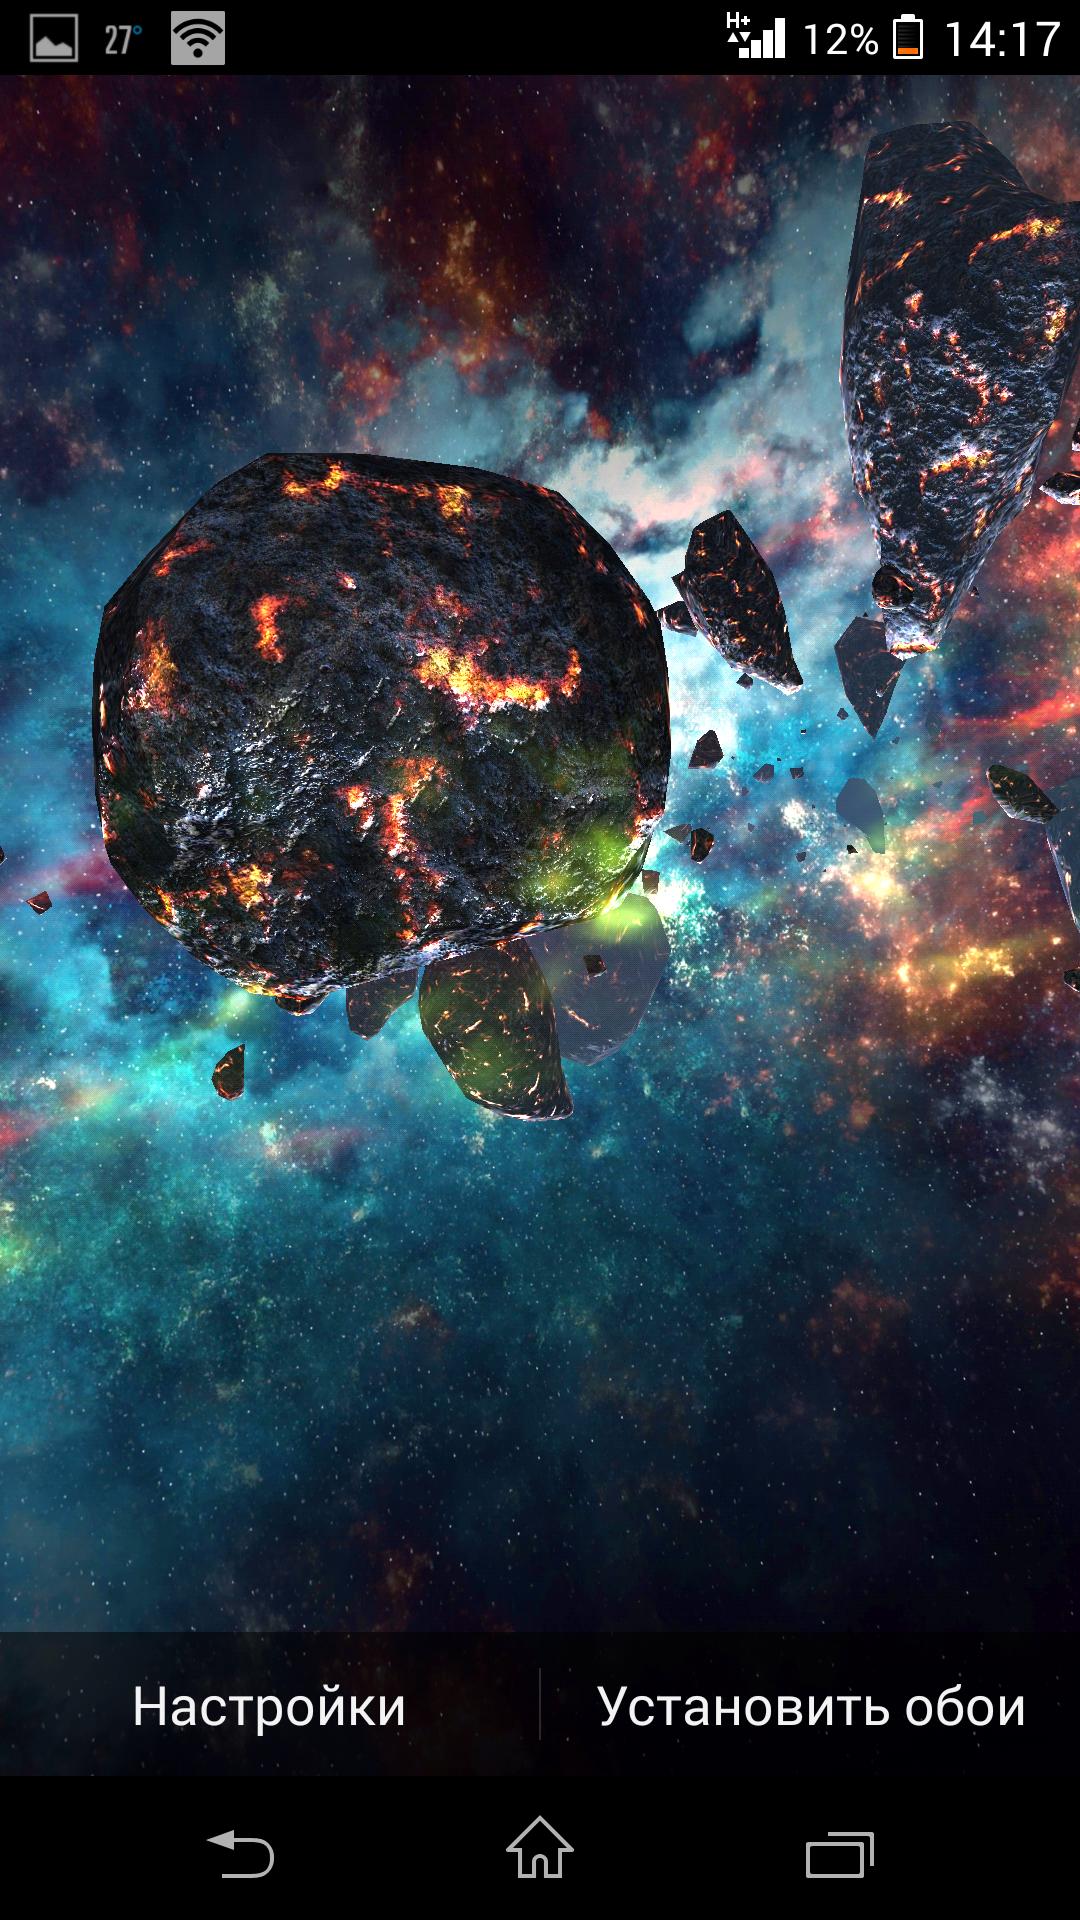 Астероиды - Asteroids Pack для Android